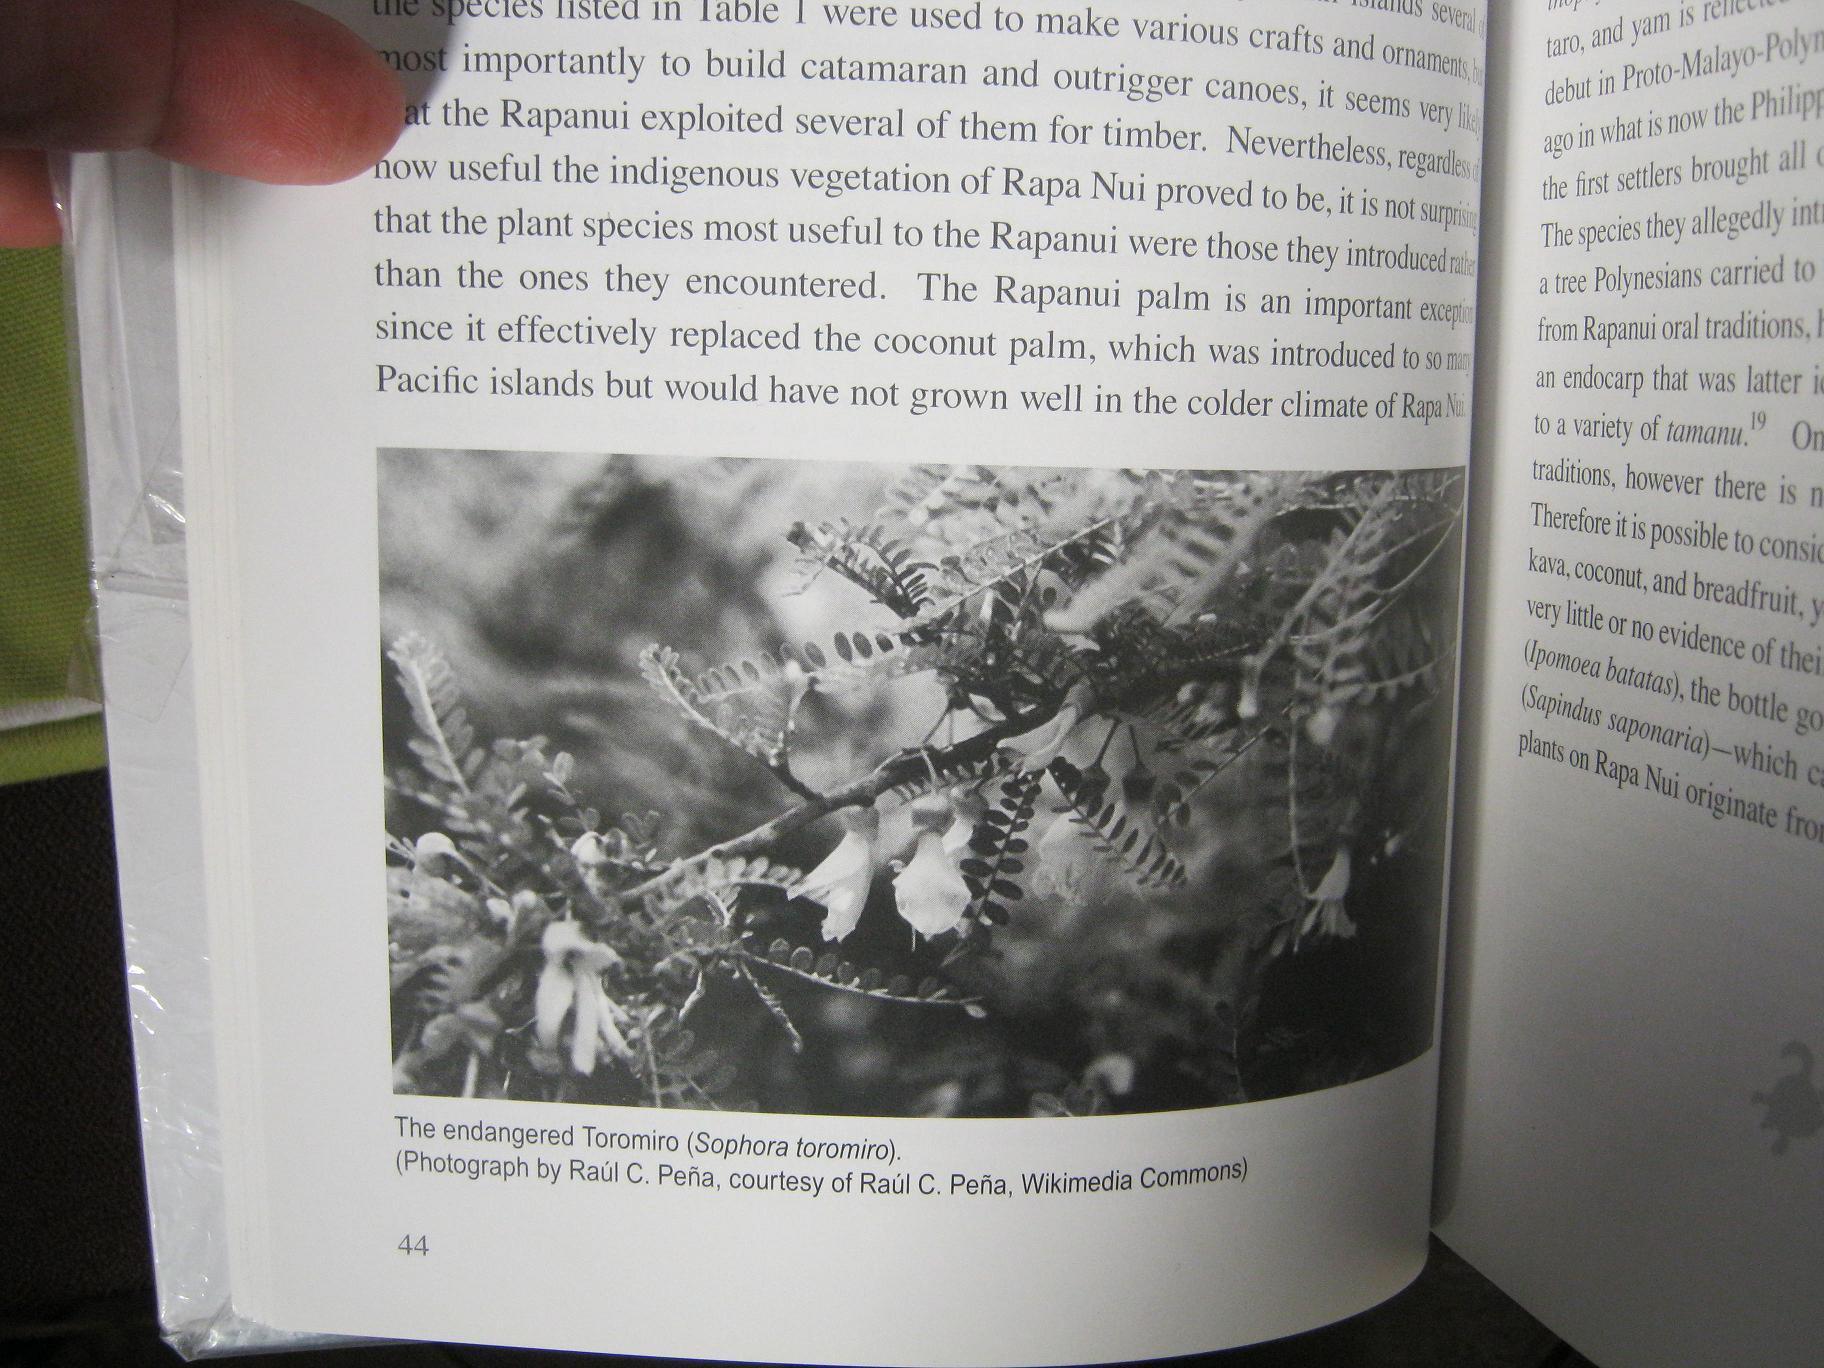 Image of Toromiro tree